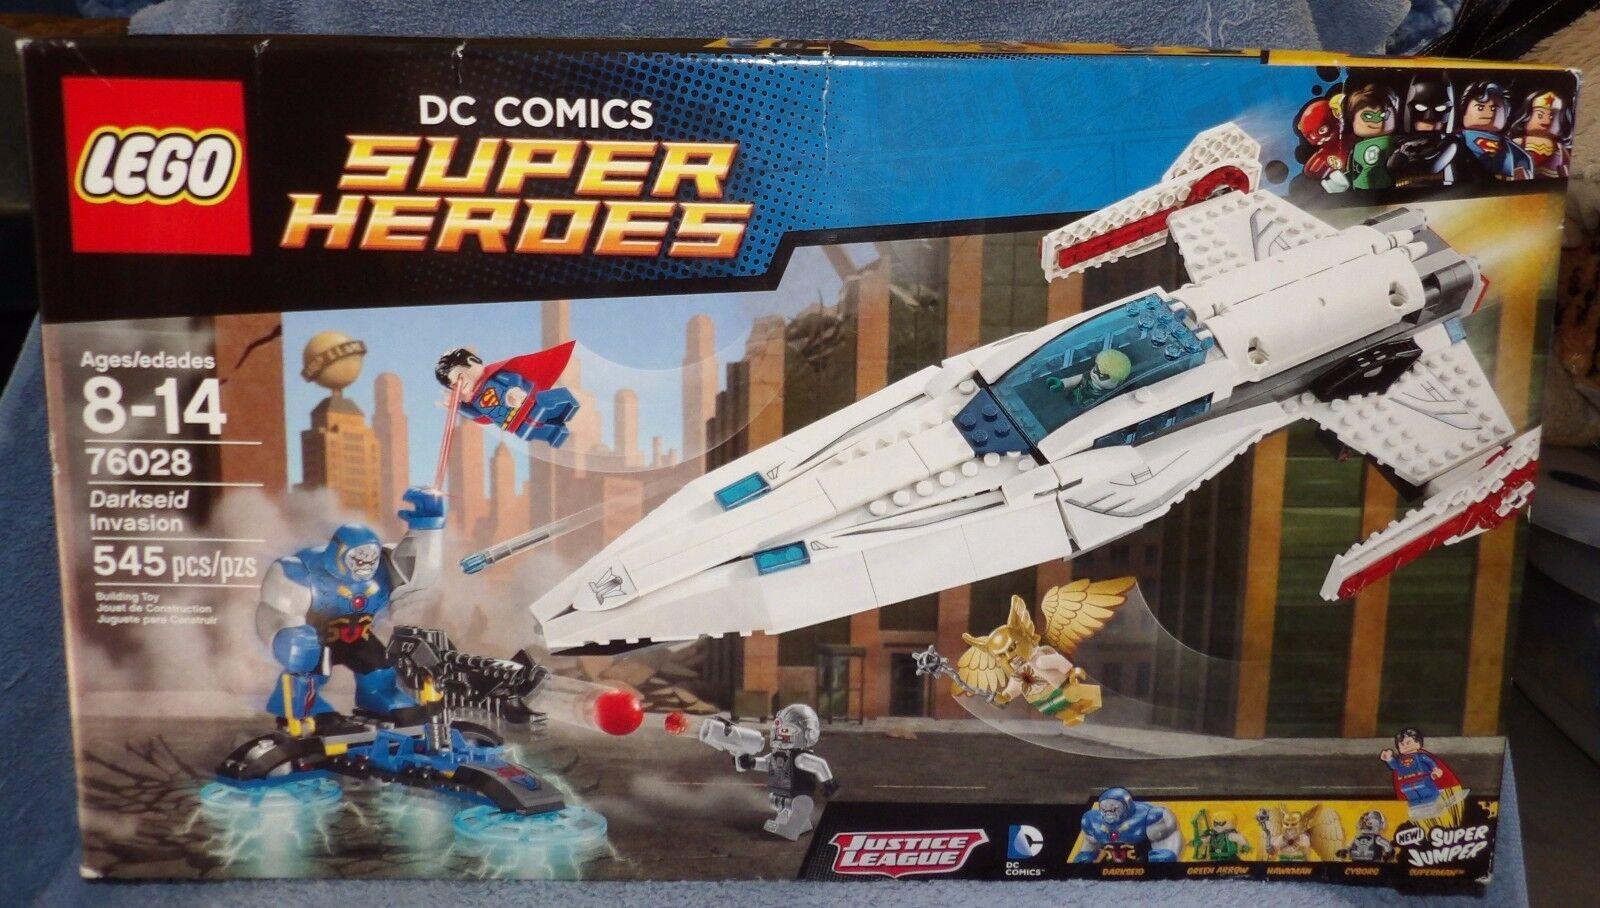 LEGO DC Comics Super Super Super Heroes DARKSEID invasión  bienvenido a comprar